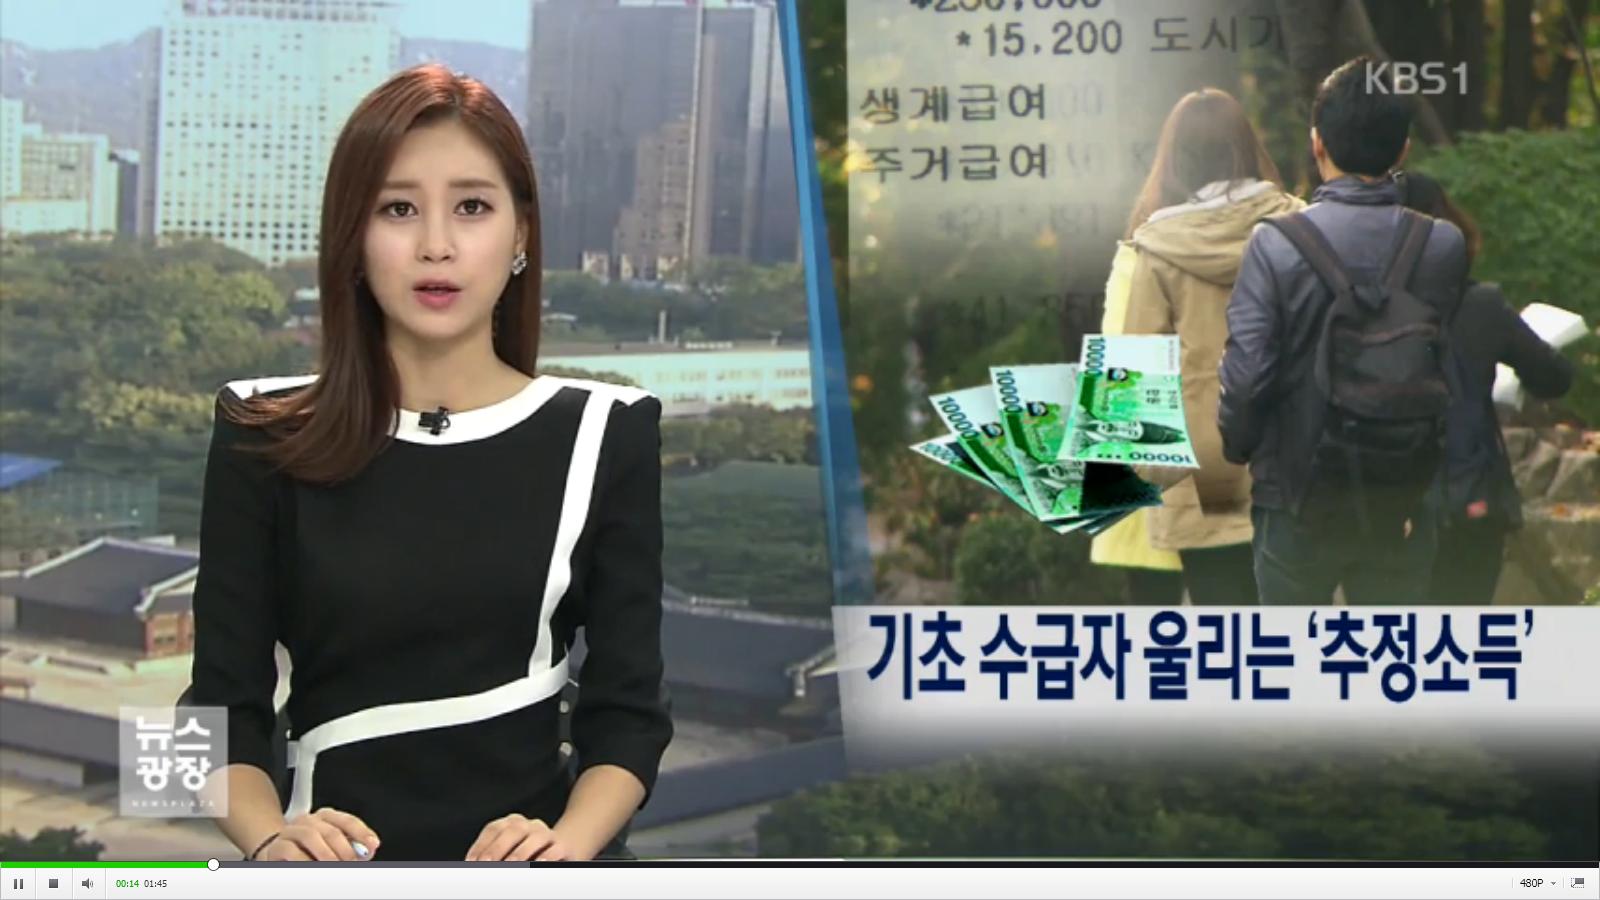 [15.9.24 KBS] 휴학하면 소득 생기나 기초 수급자 울리는 추정소득1.png